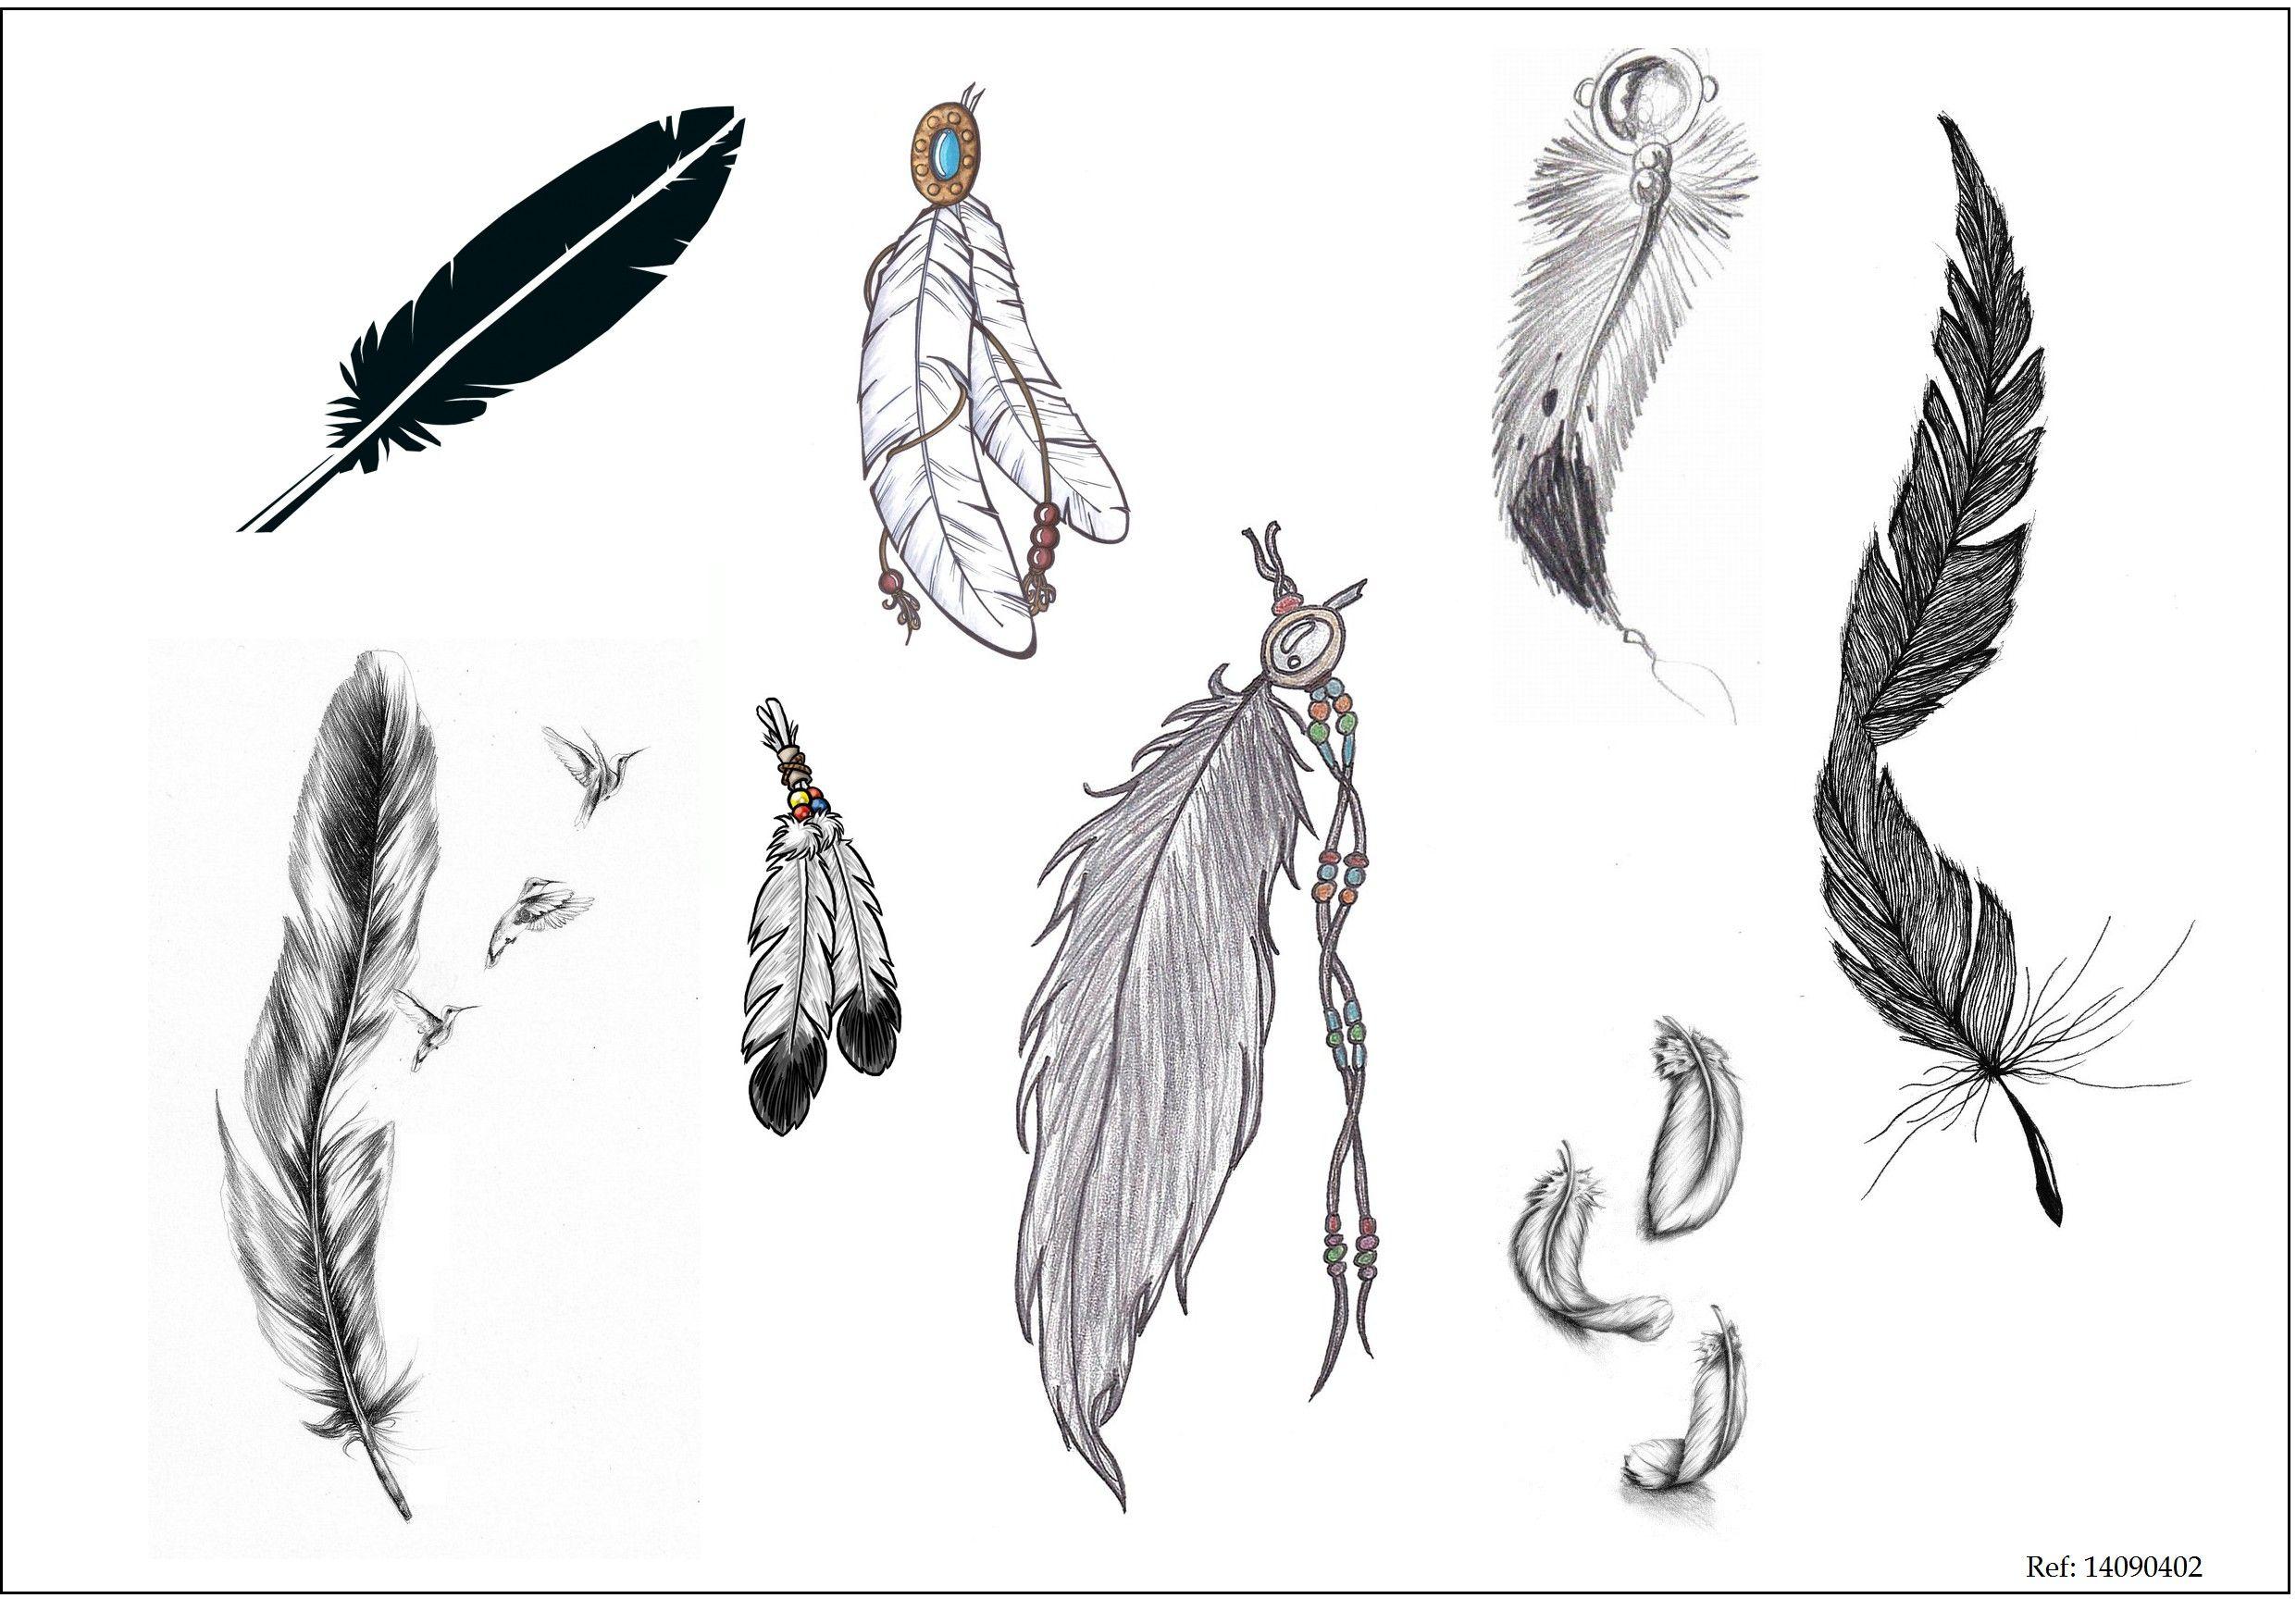 tatouage plume pied recherche google tattoo pinterest tatoo ink art and tattoo. Black Bedroom Furniture Sets. Home Design Ideas